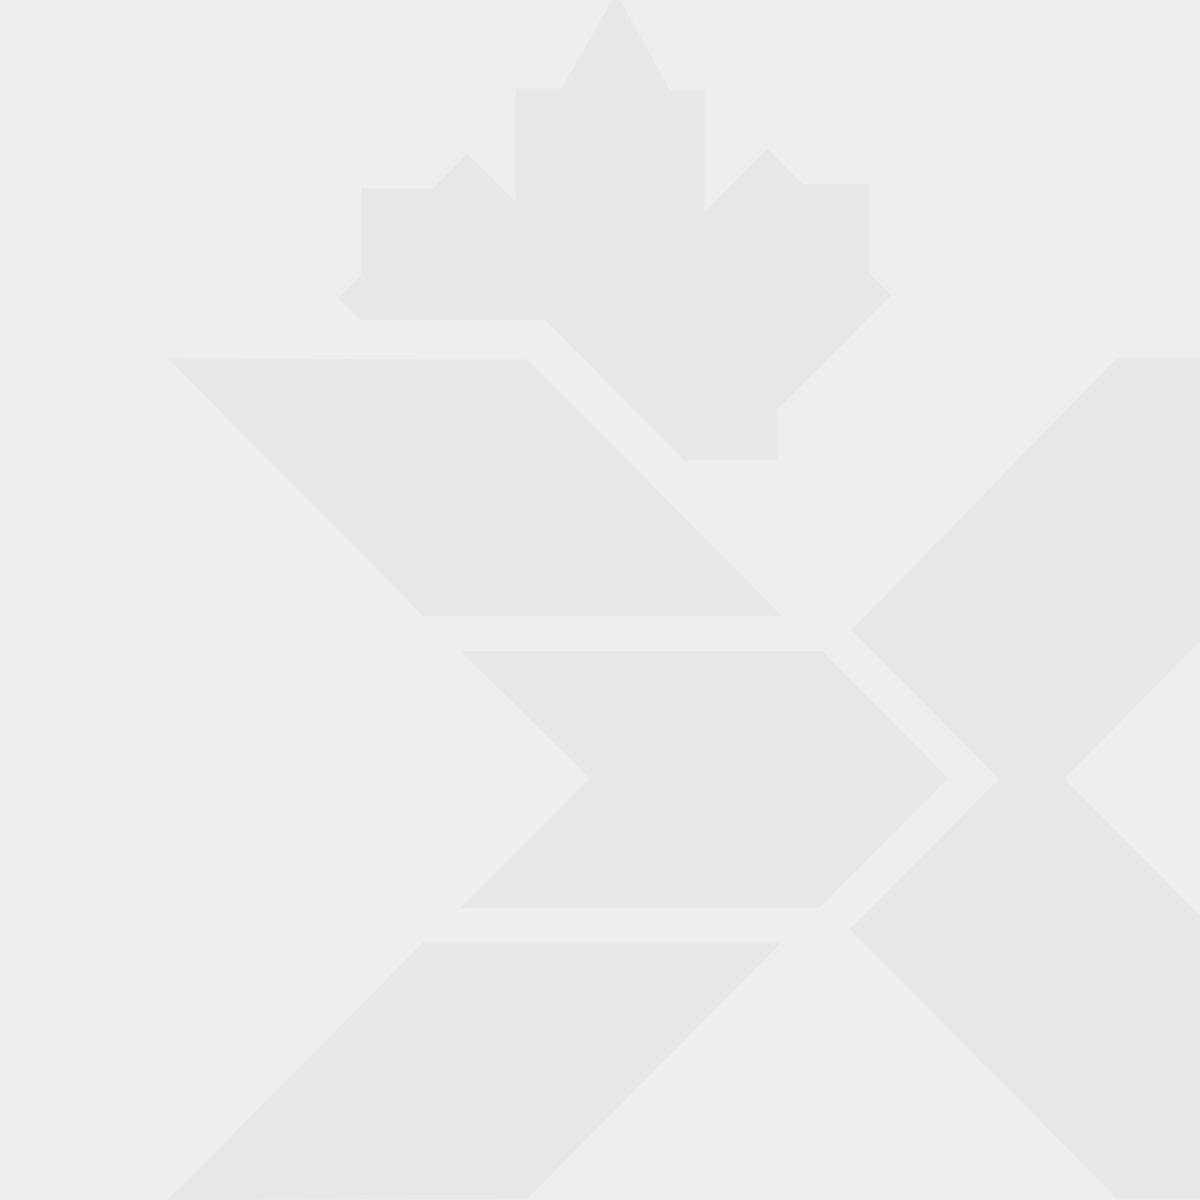 Michael Kors Women's Slim Runway Luggage Leather Strap Watch (MK2326 )